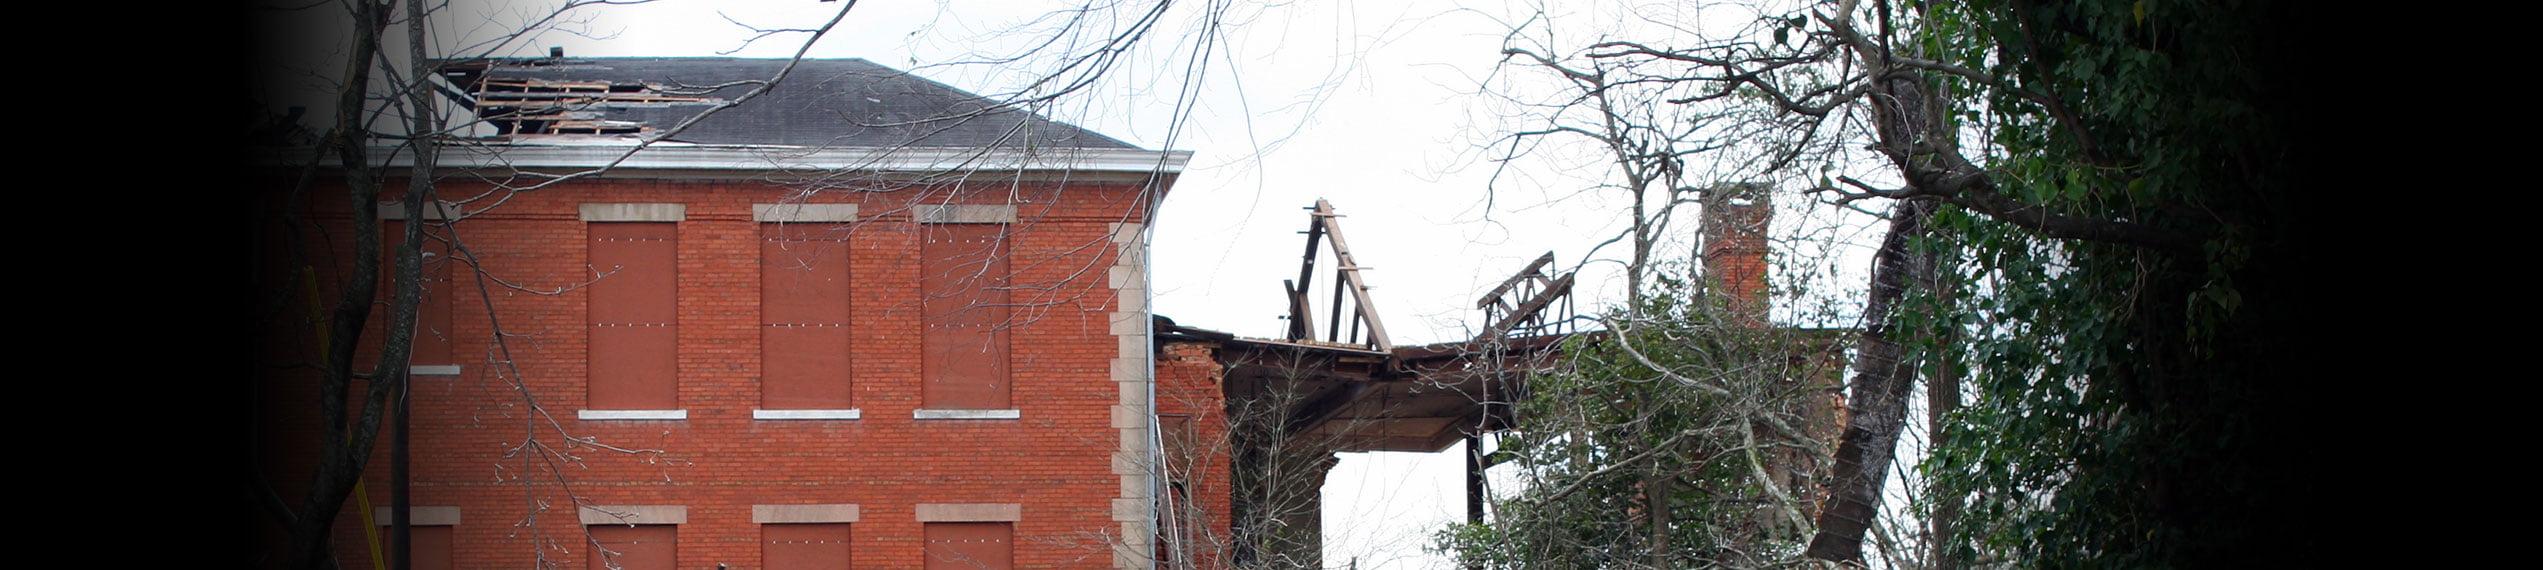 Wind & Storm Damage Repairs in Paul Davis Restoration of Ocean & Monmouth Counties